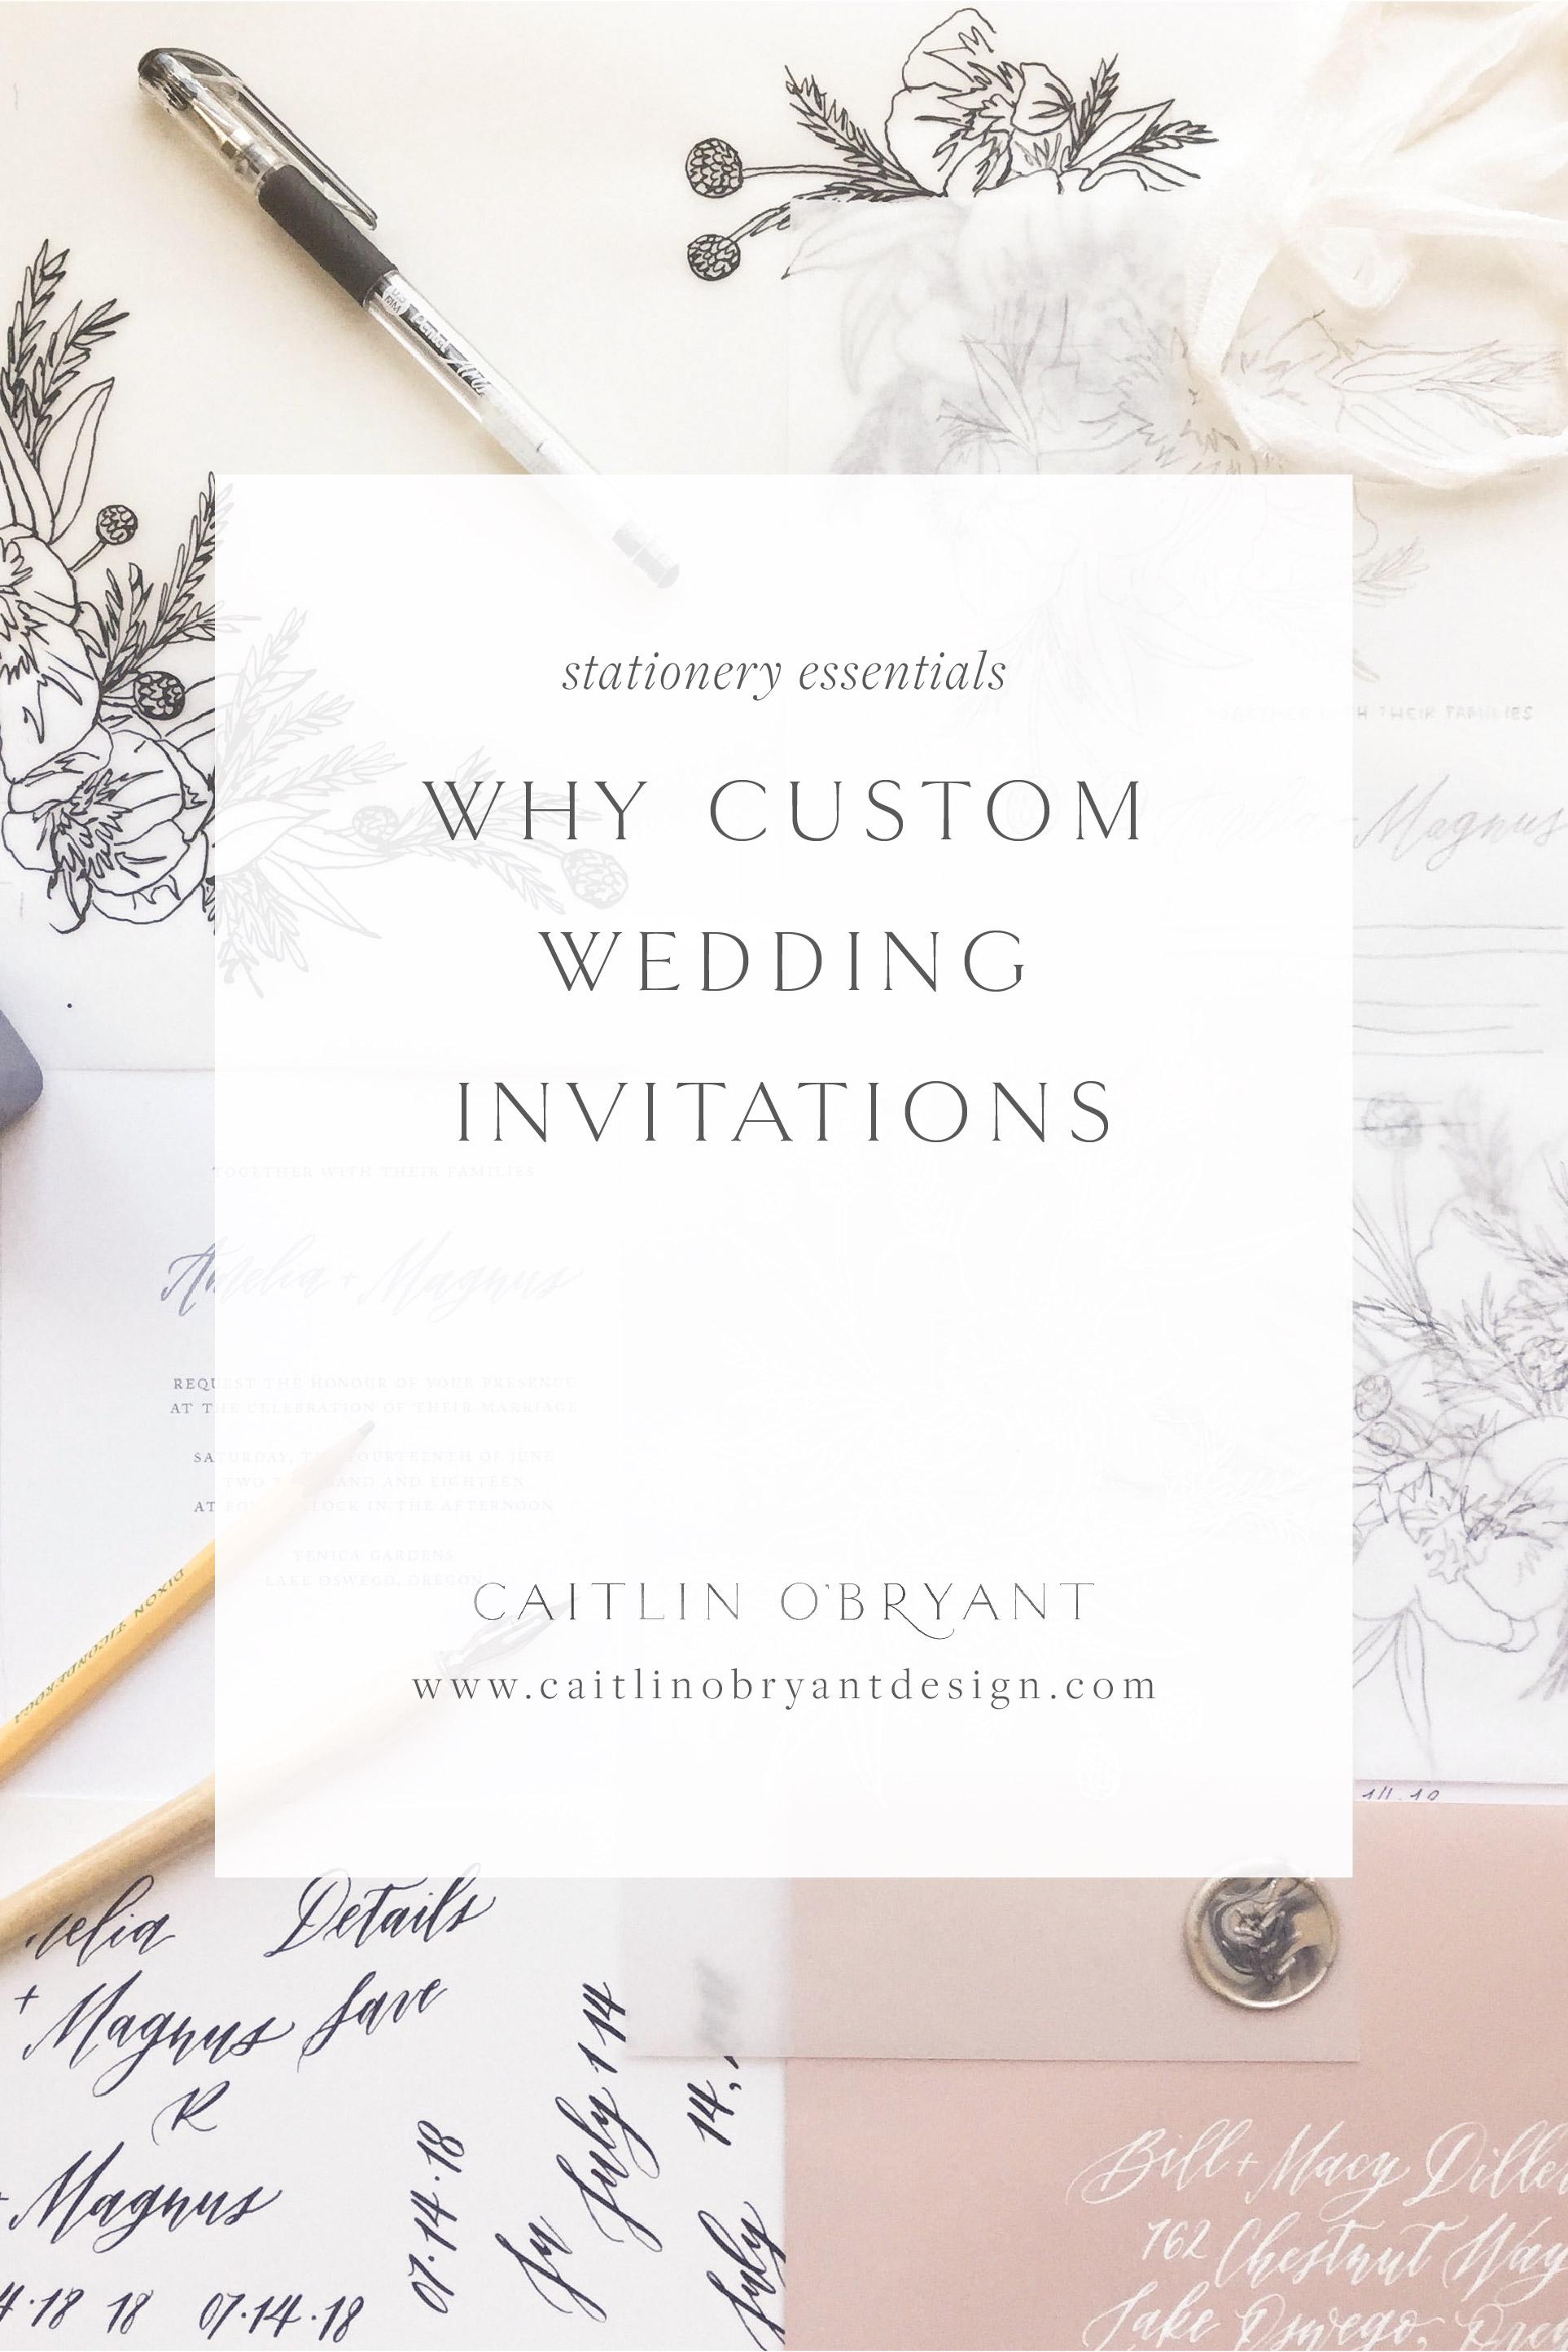 The benefits of custom wedding invitations. Why choose custom wedding stationery.